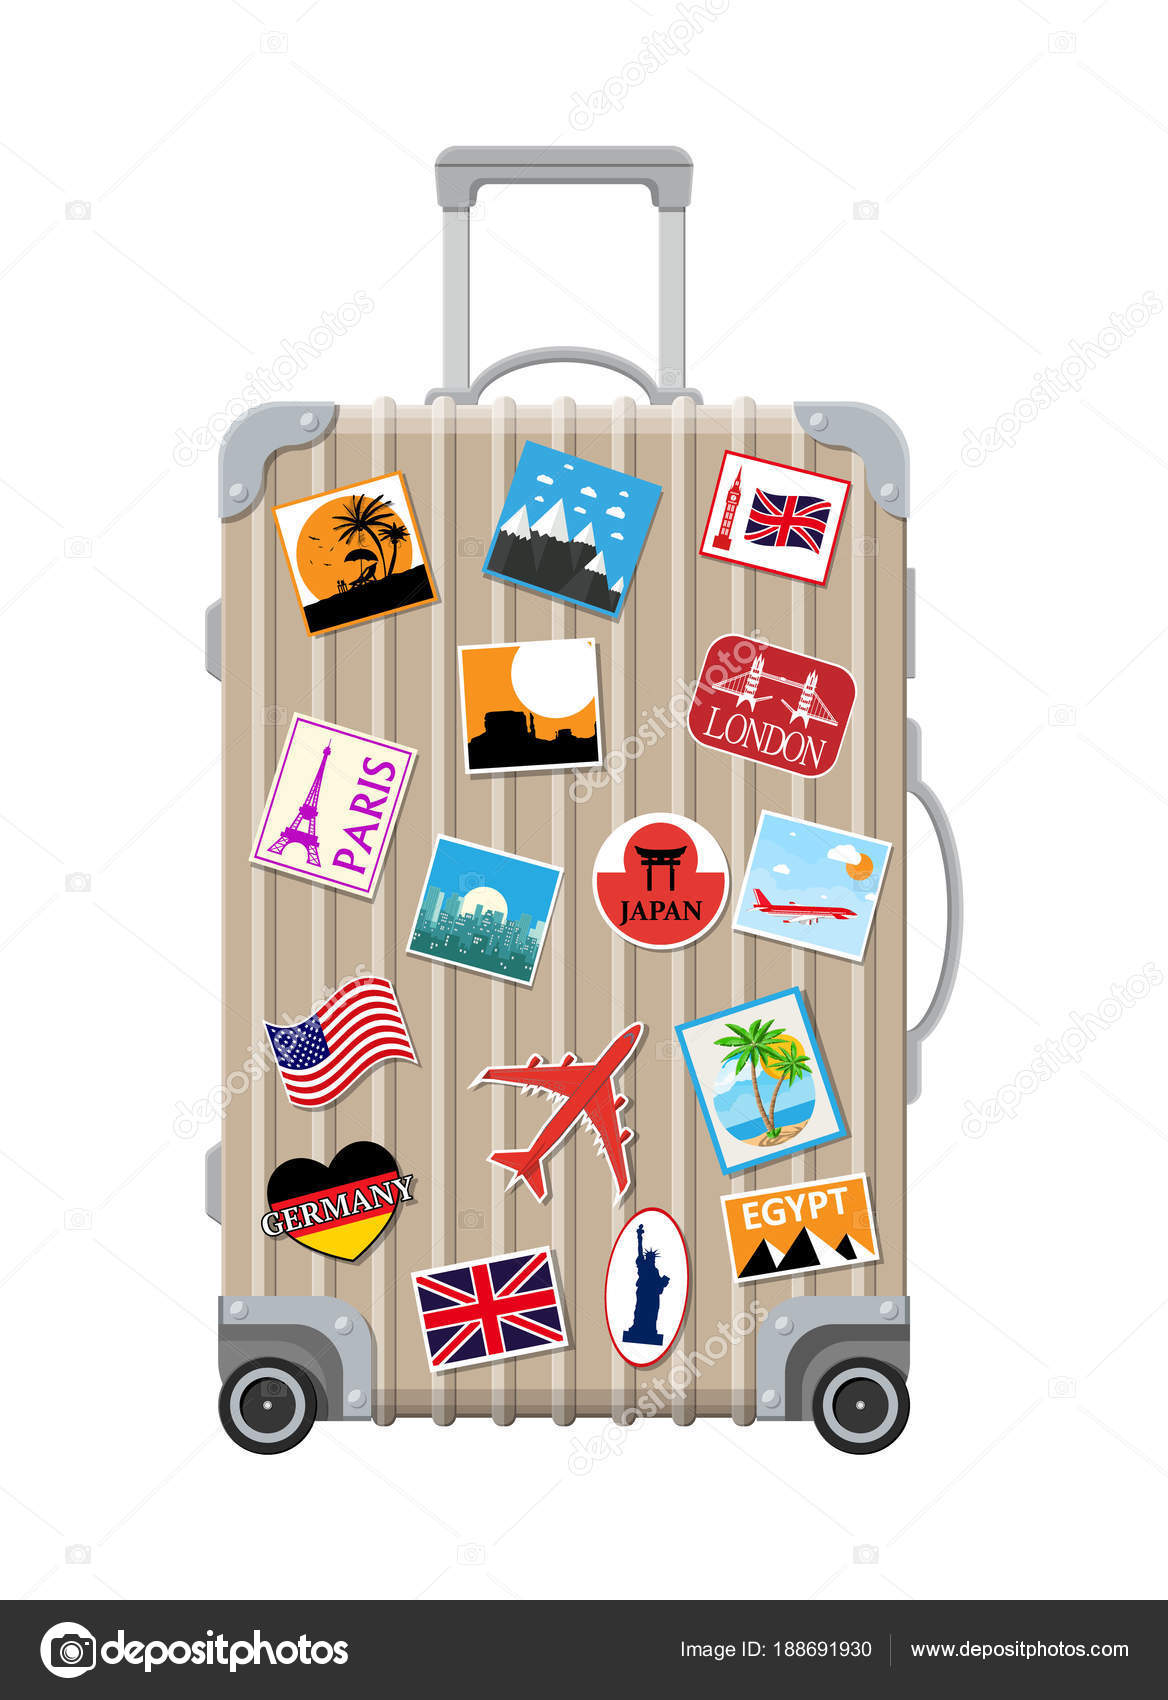 74b23a48df Ασημένια ταξιδιωτική τσάντα. Πλαστική θήκη με αυτοκόλλητα. Καροτσάκι με  ρόδες. Ετικέτες countrys και citys σε όλο τον κόσμο. Αποσκευές και χώρο  φύλαξης ...